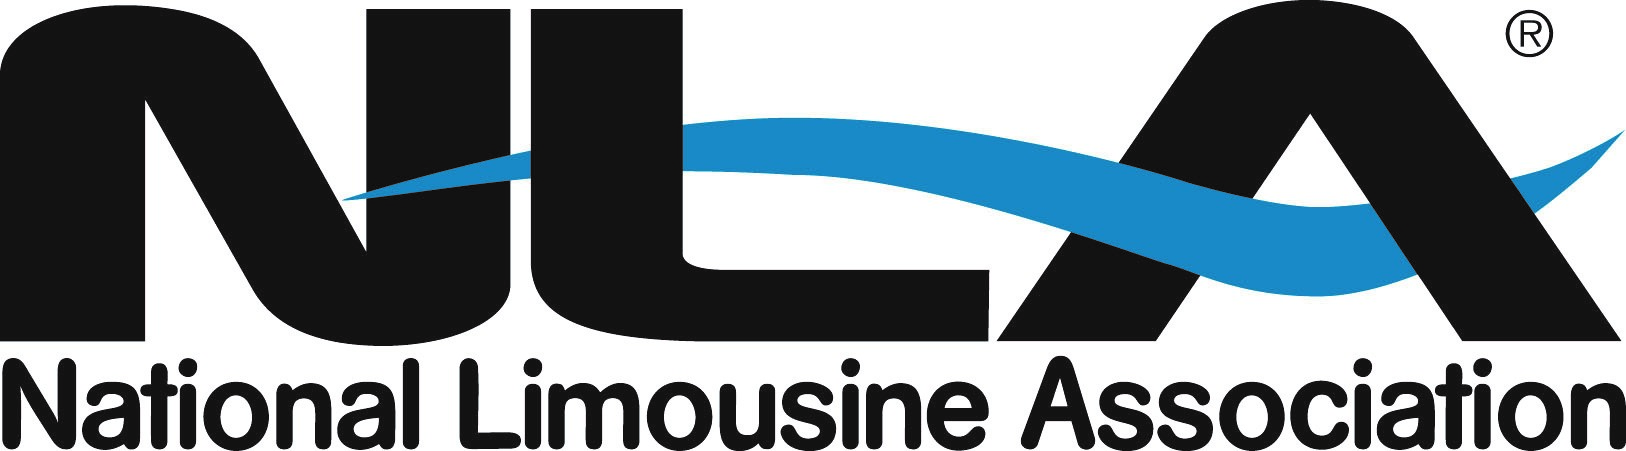 nla-logo